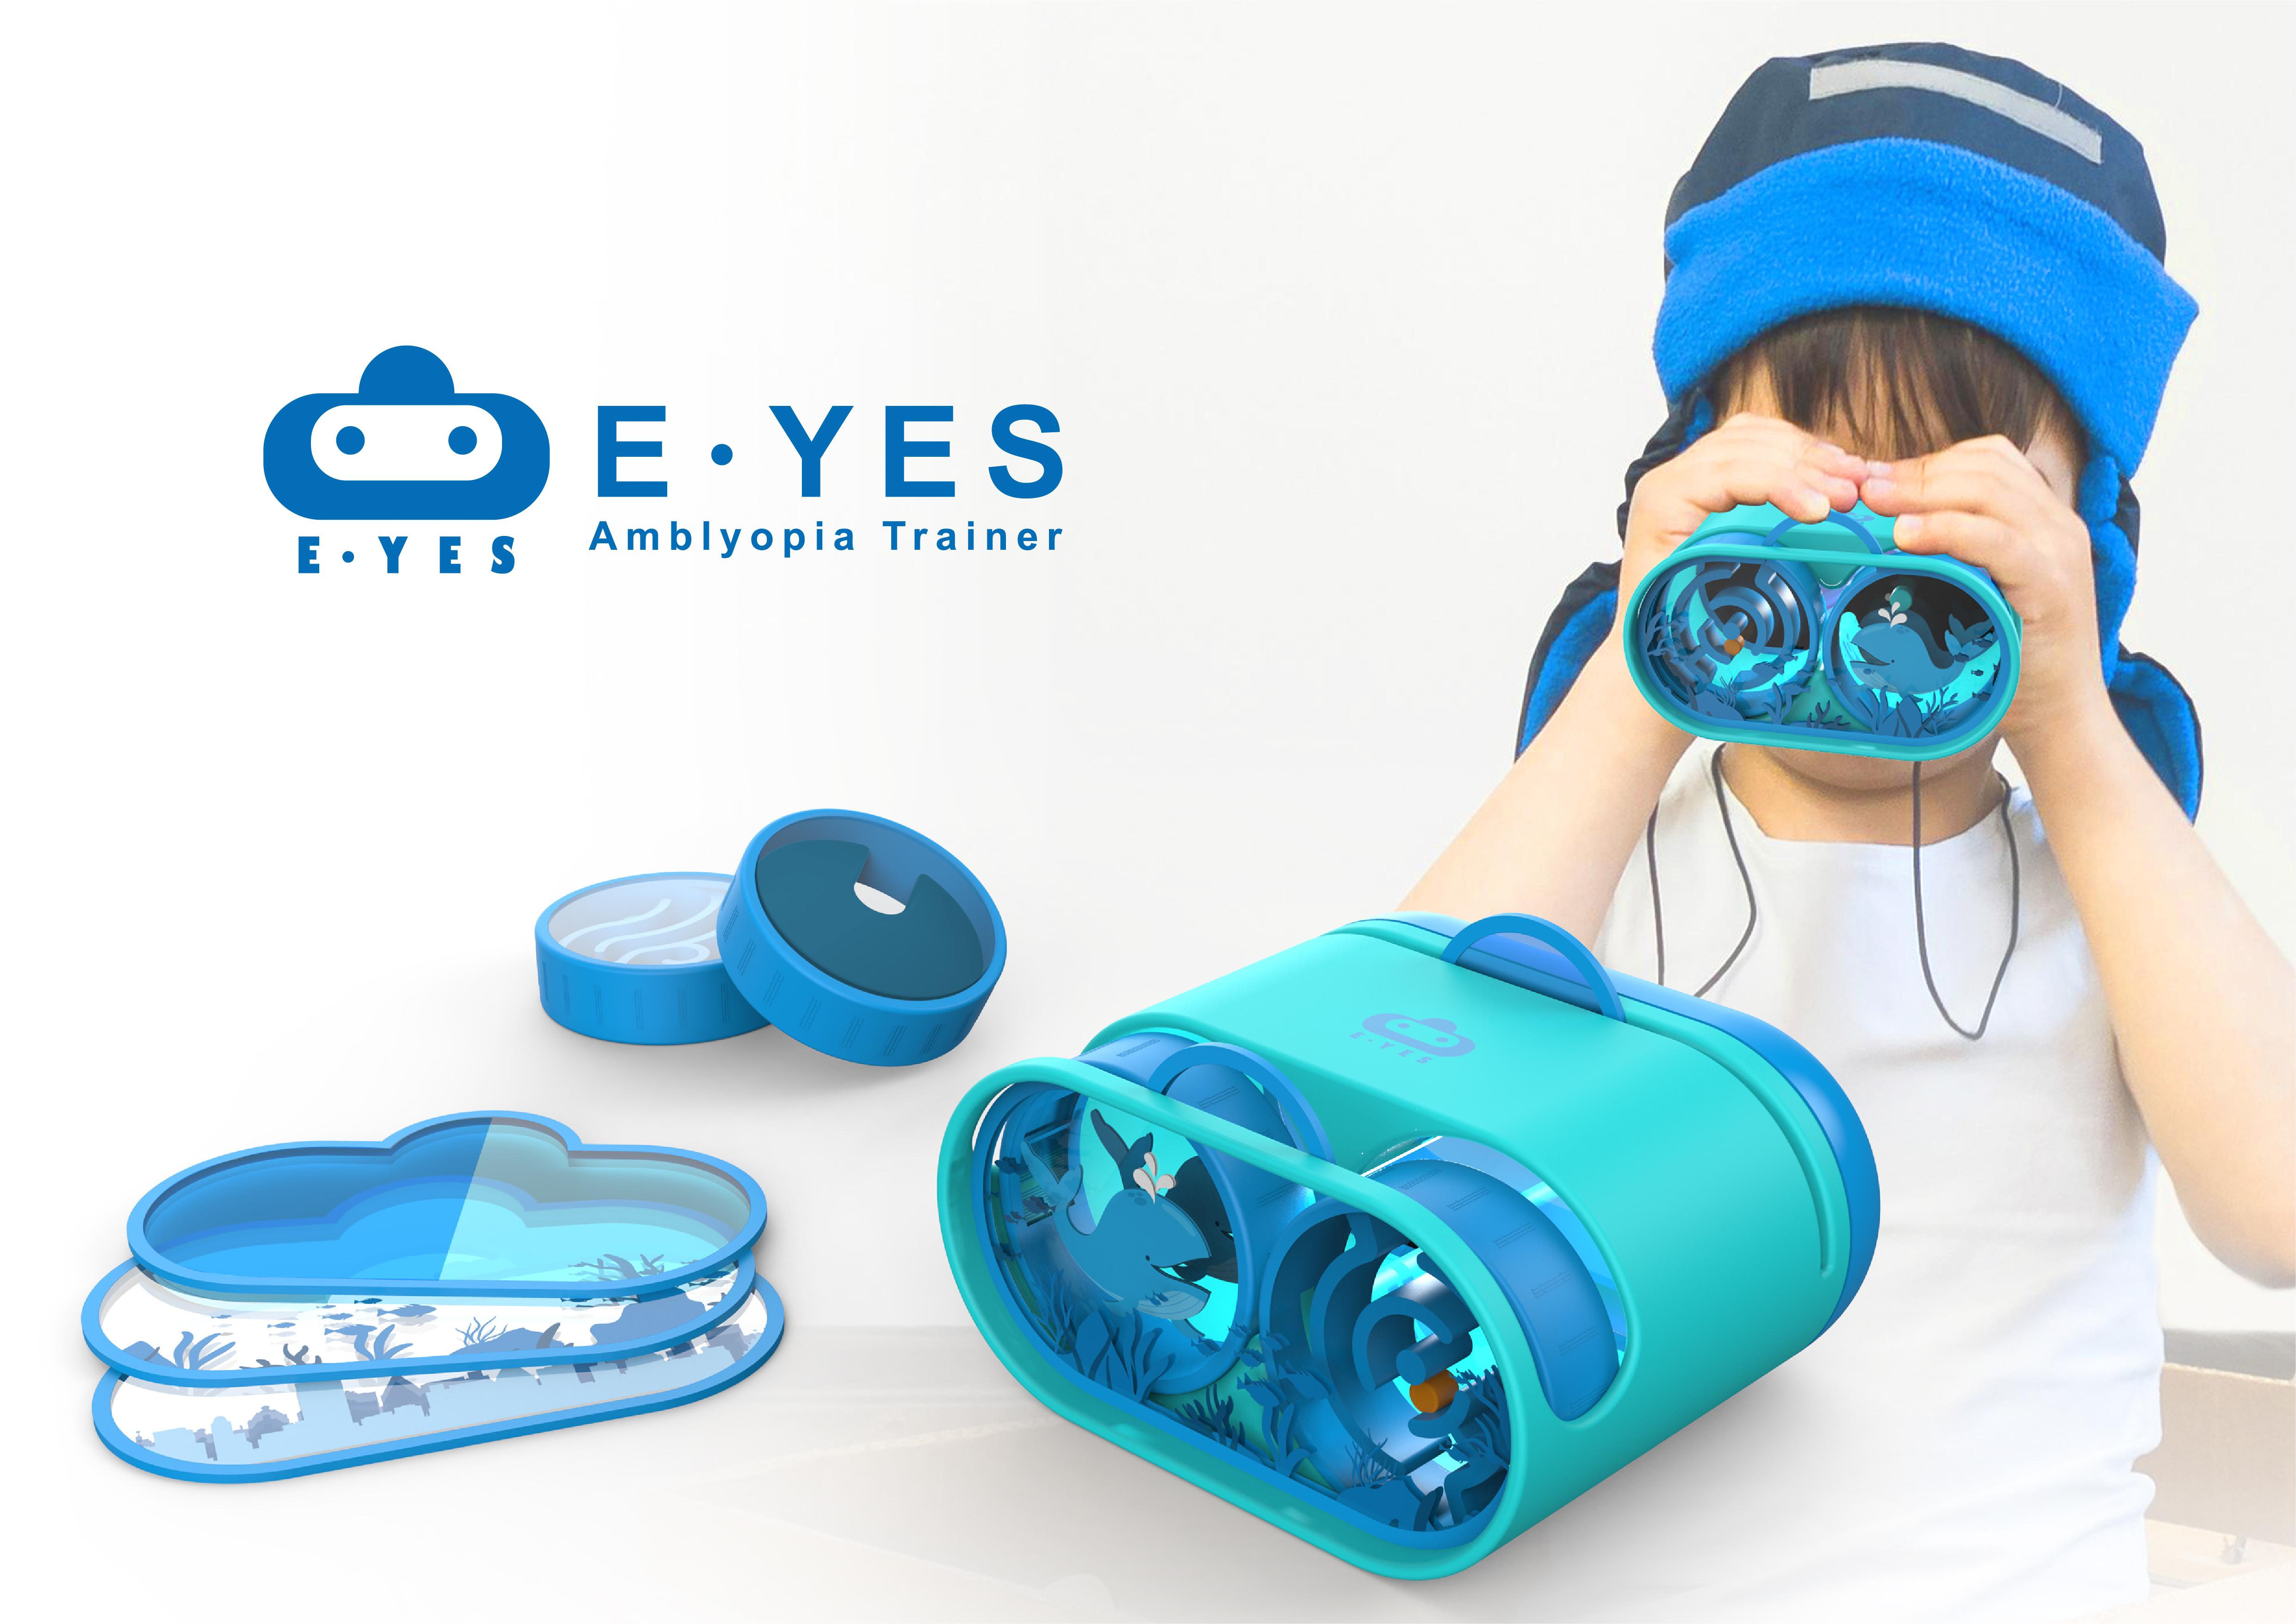 E-YES Amblyopia Trainer